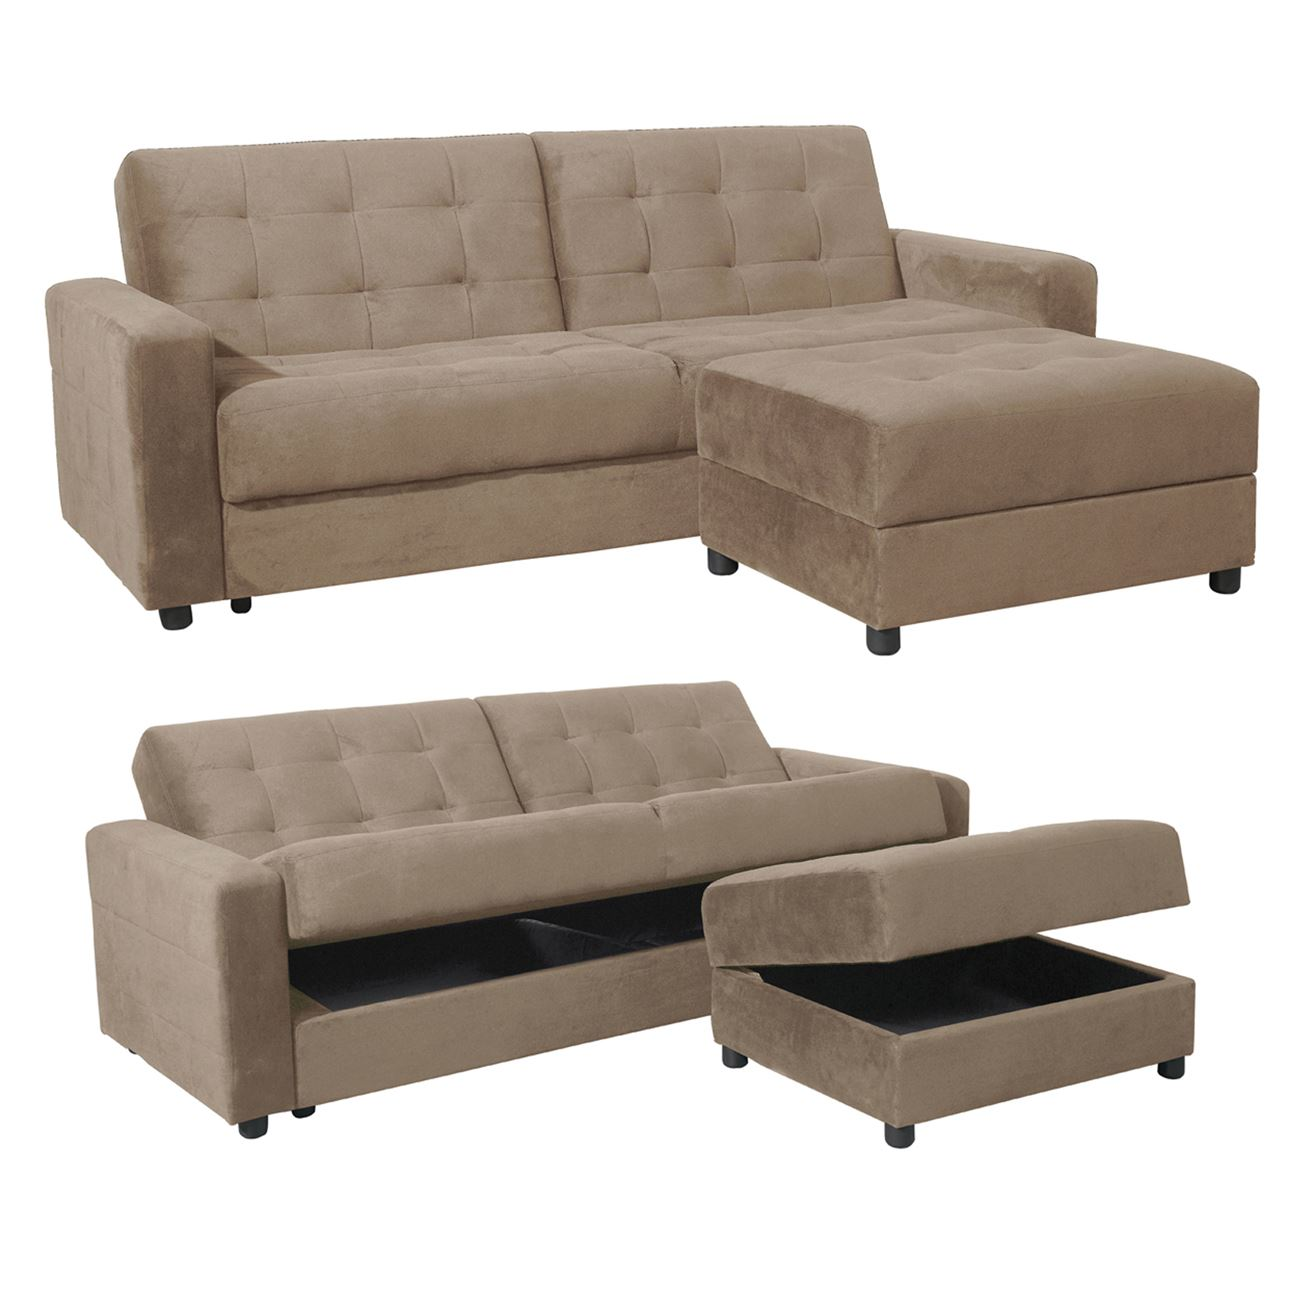 Marvelous Jackson Sofabed Storage Corner Sand Beige Ibusinesslaw Wood Chair Design Ideas Ibusinesslaworg